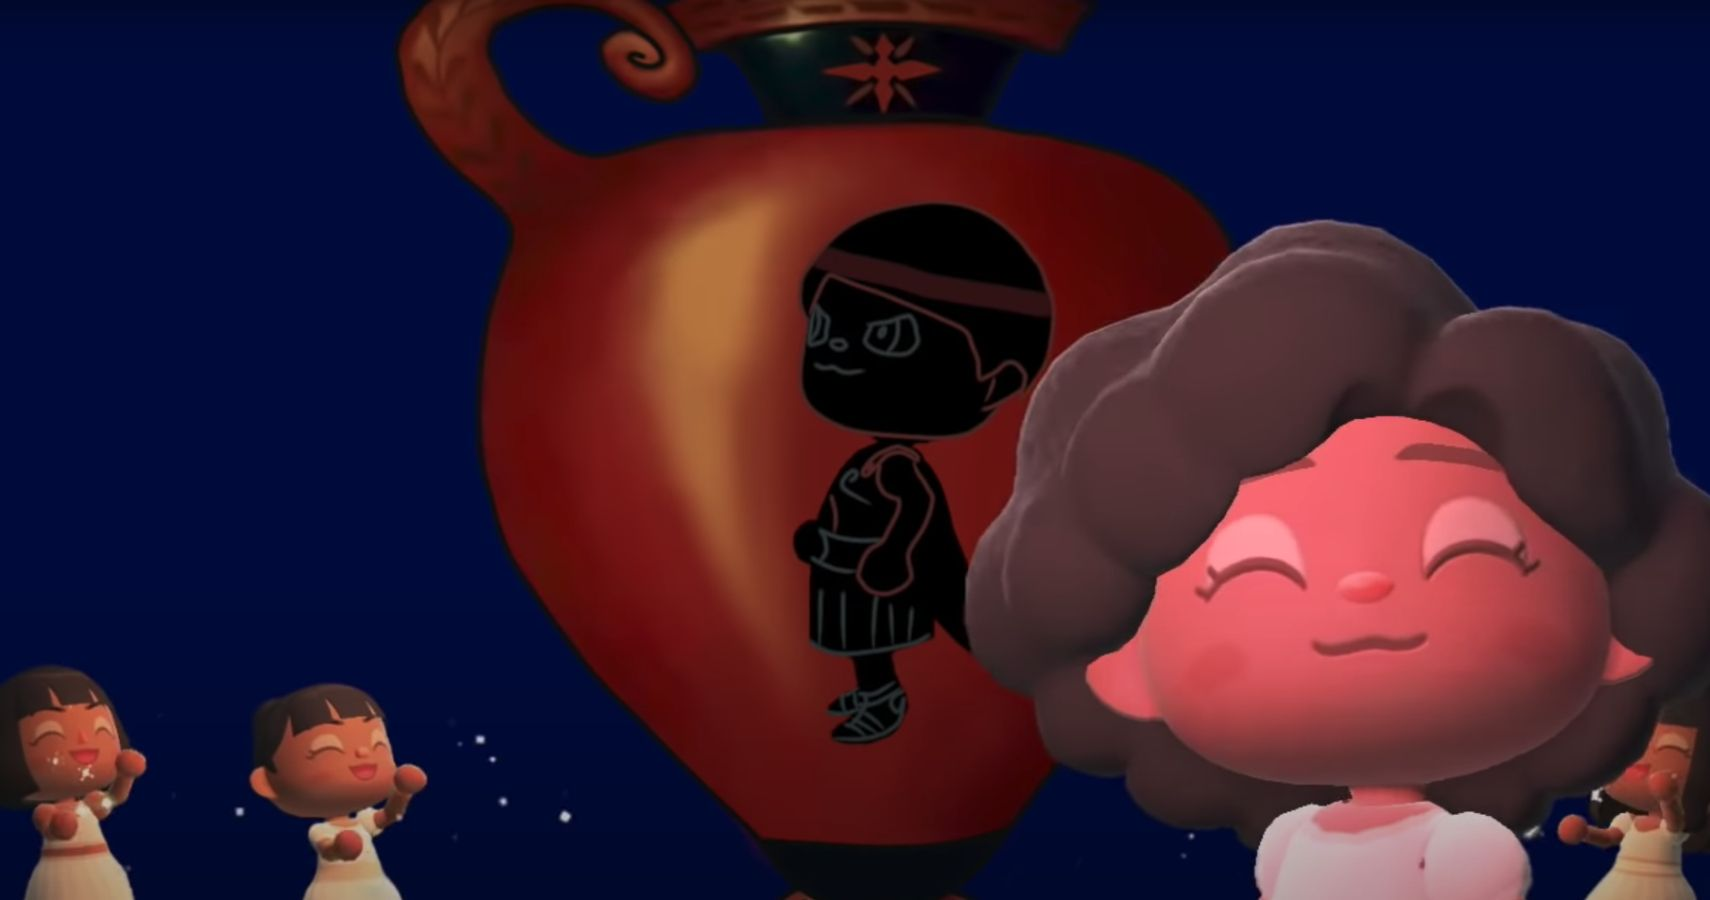 Redditor Recreates 'Zero to Hero' From Disney's Hercules In Animal Crossing: New Horizons